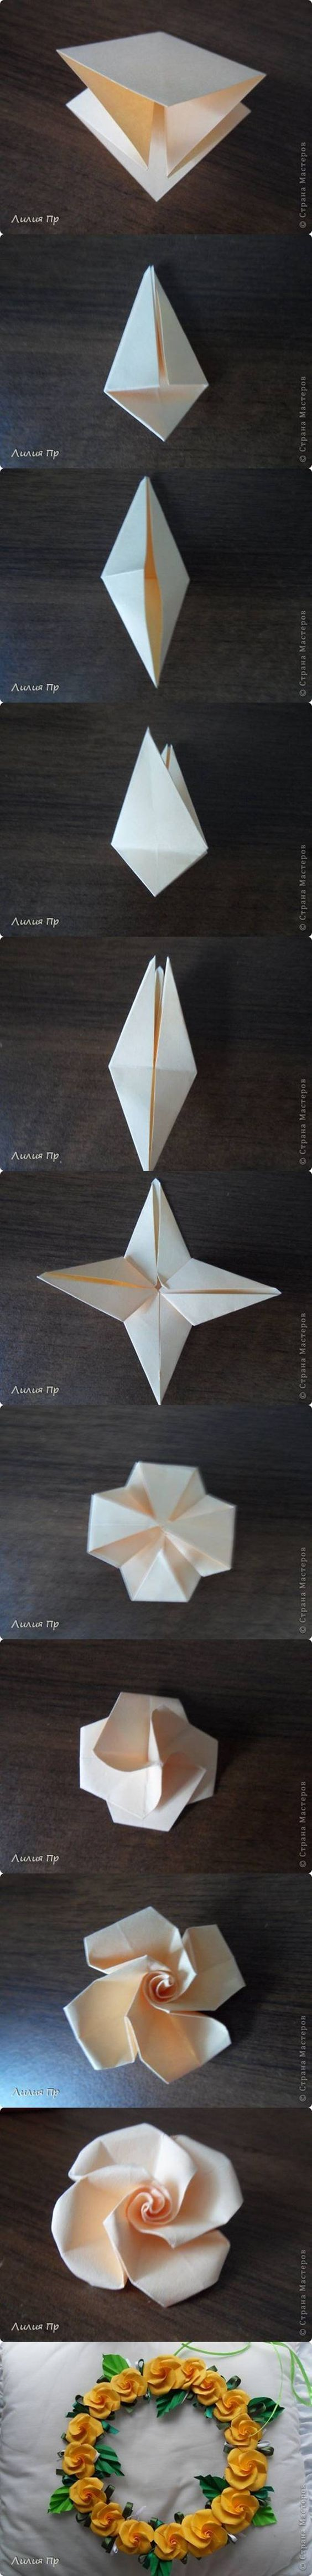 How to DIY Beautiful Origami Rose #craft #Origami: